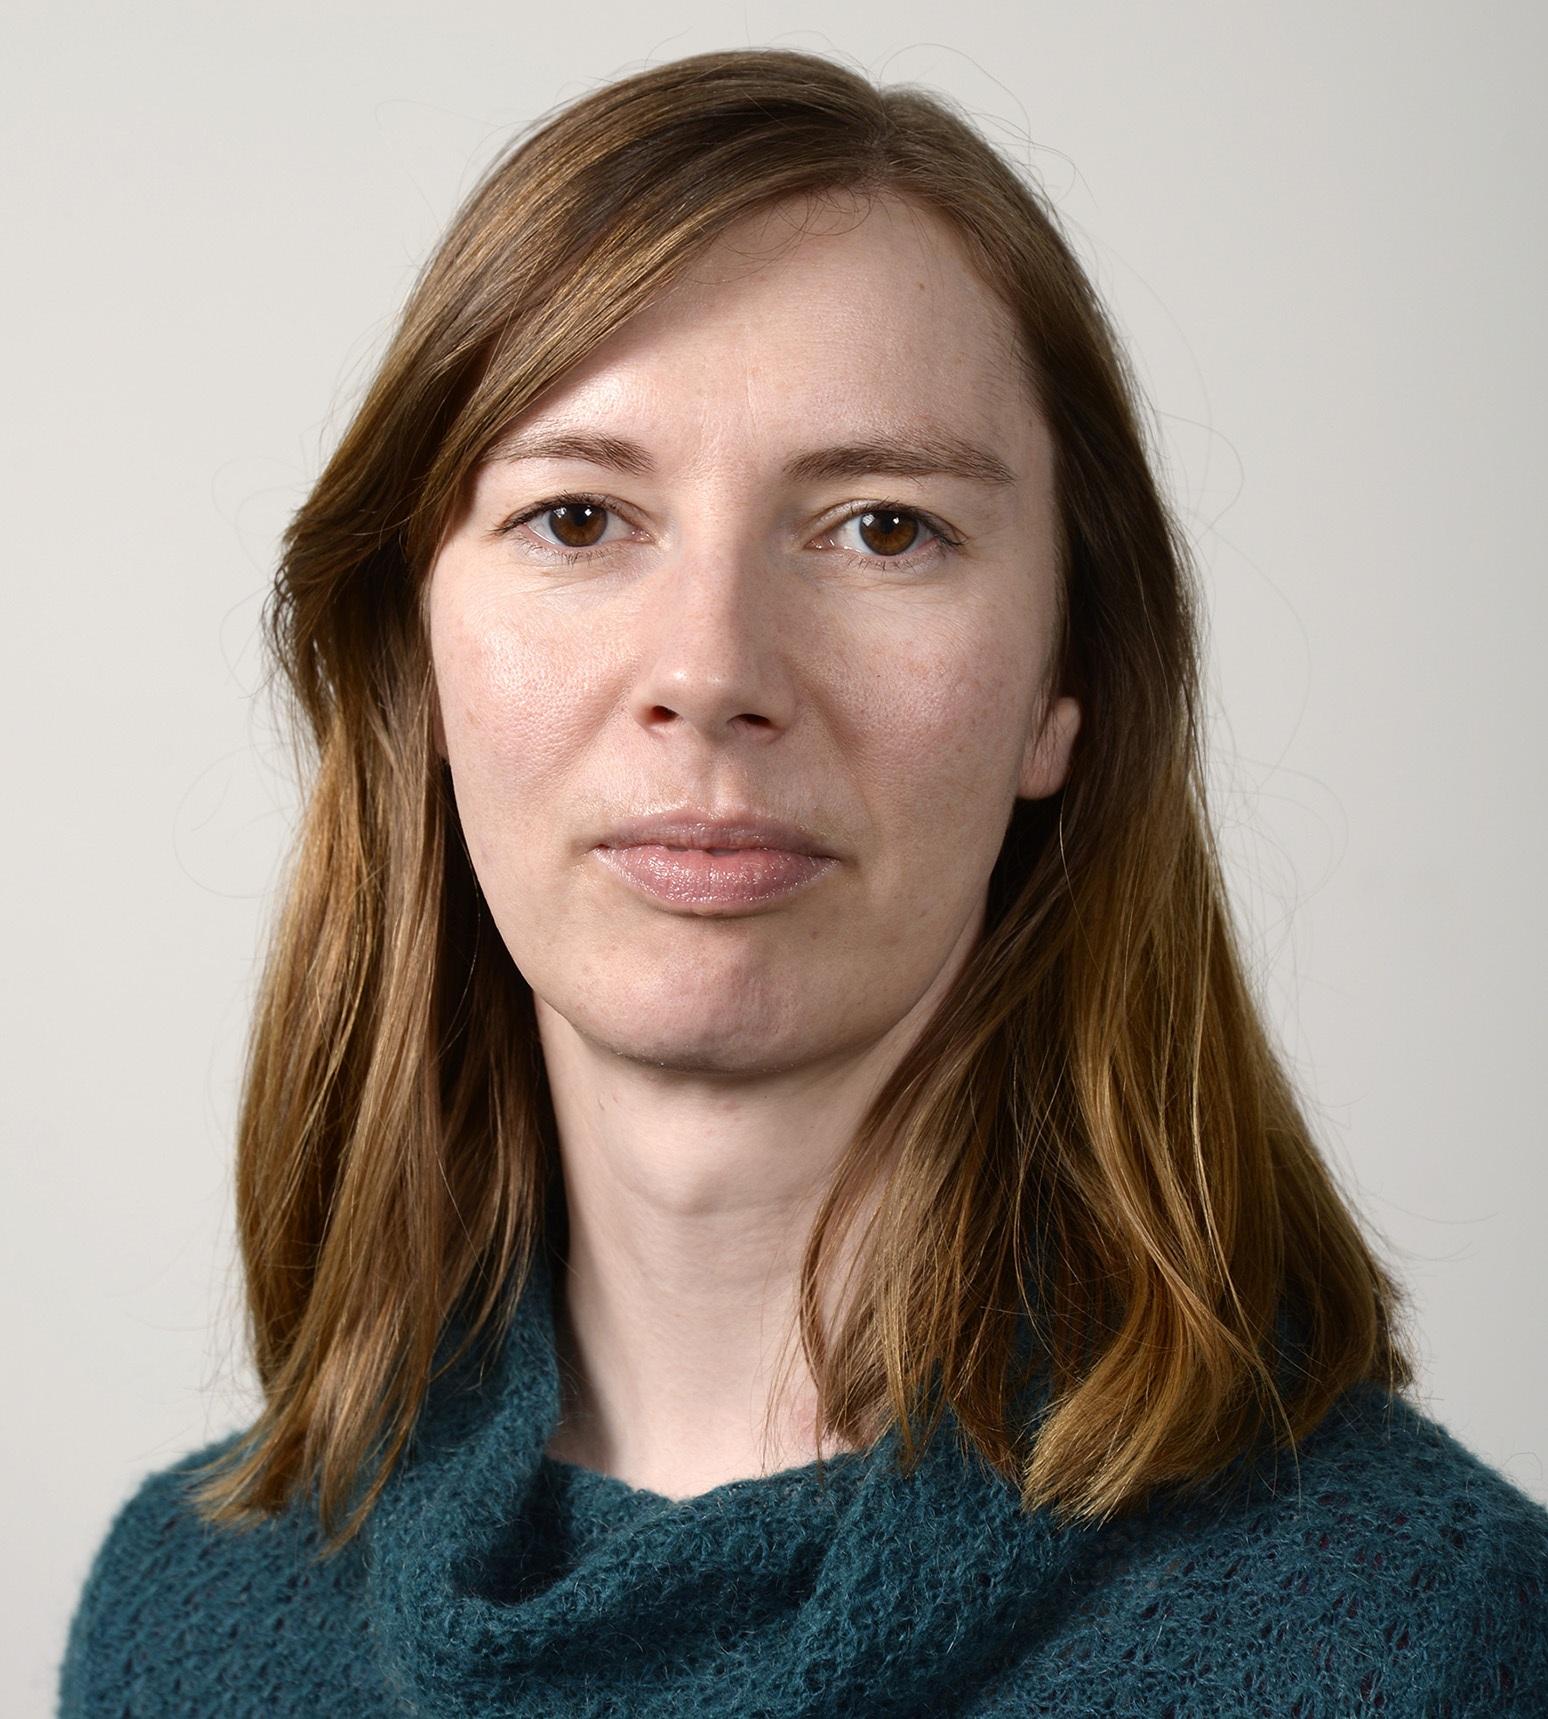 Hanne Hoaas disputerer 6. juni! Foto: Rune S. Bertinussen